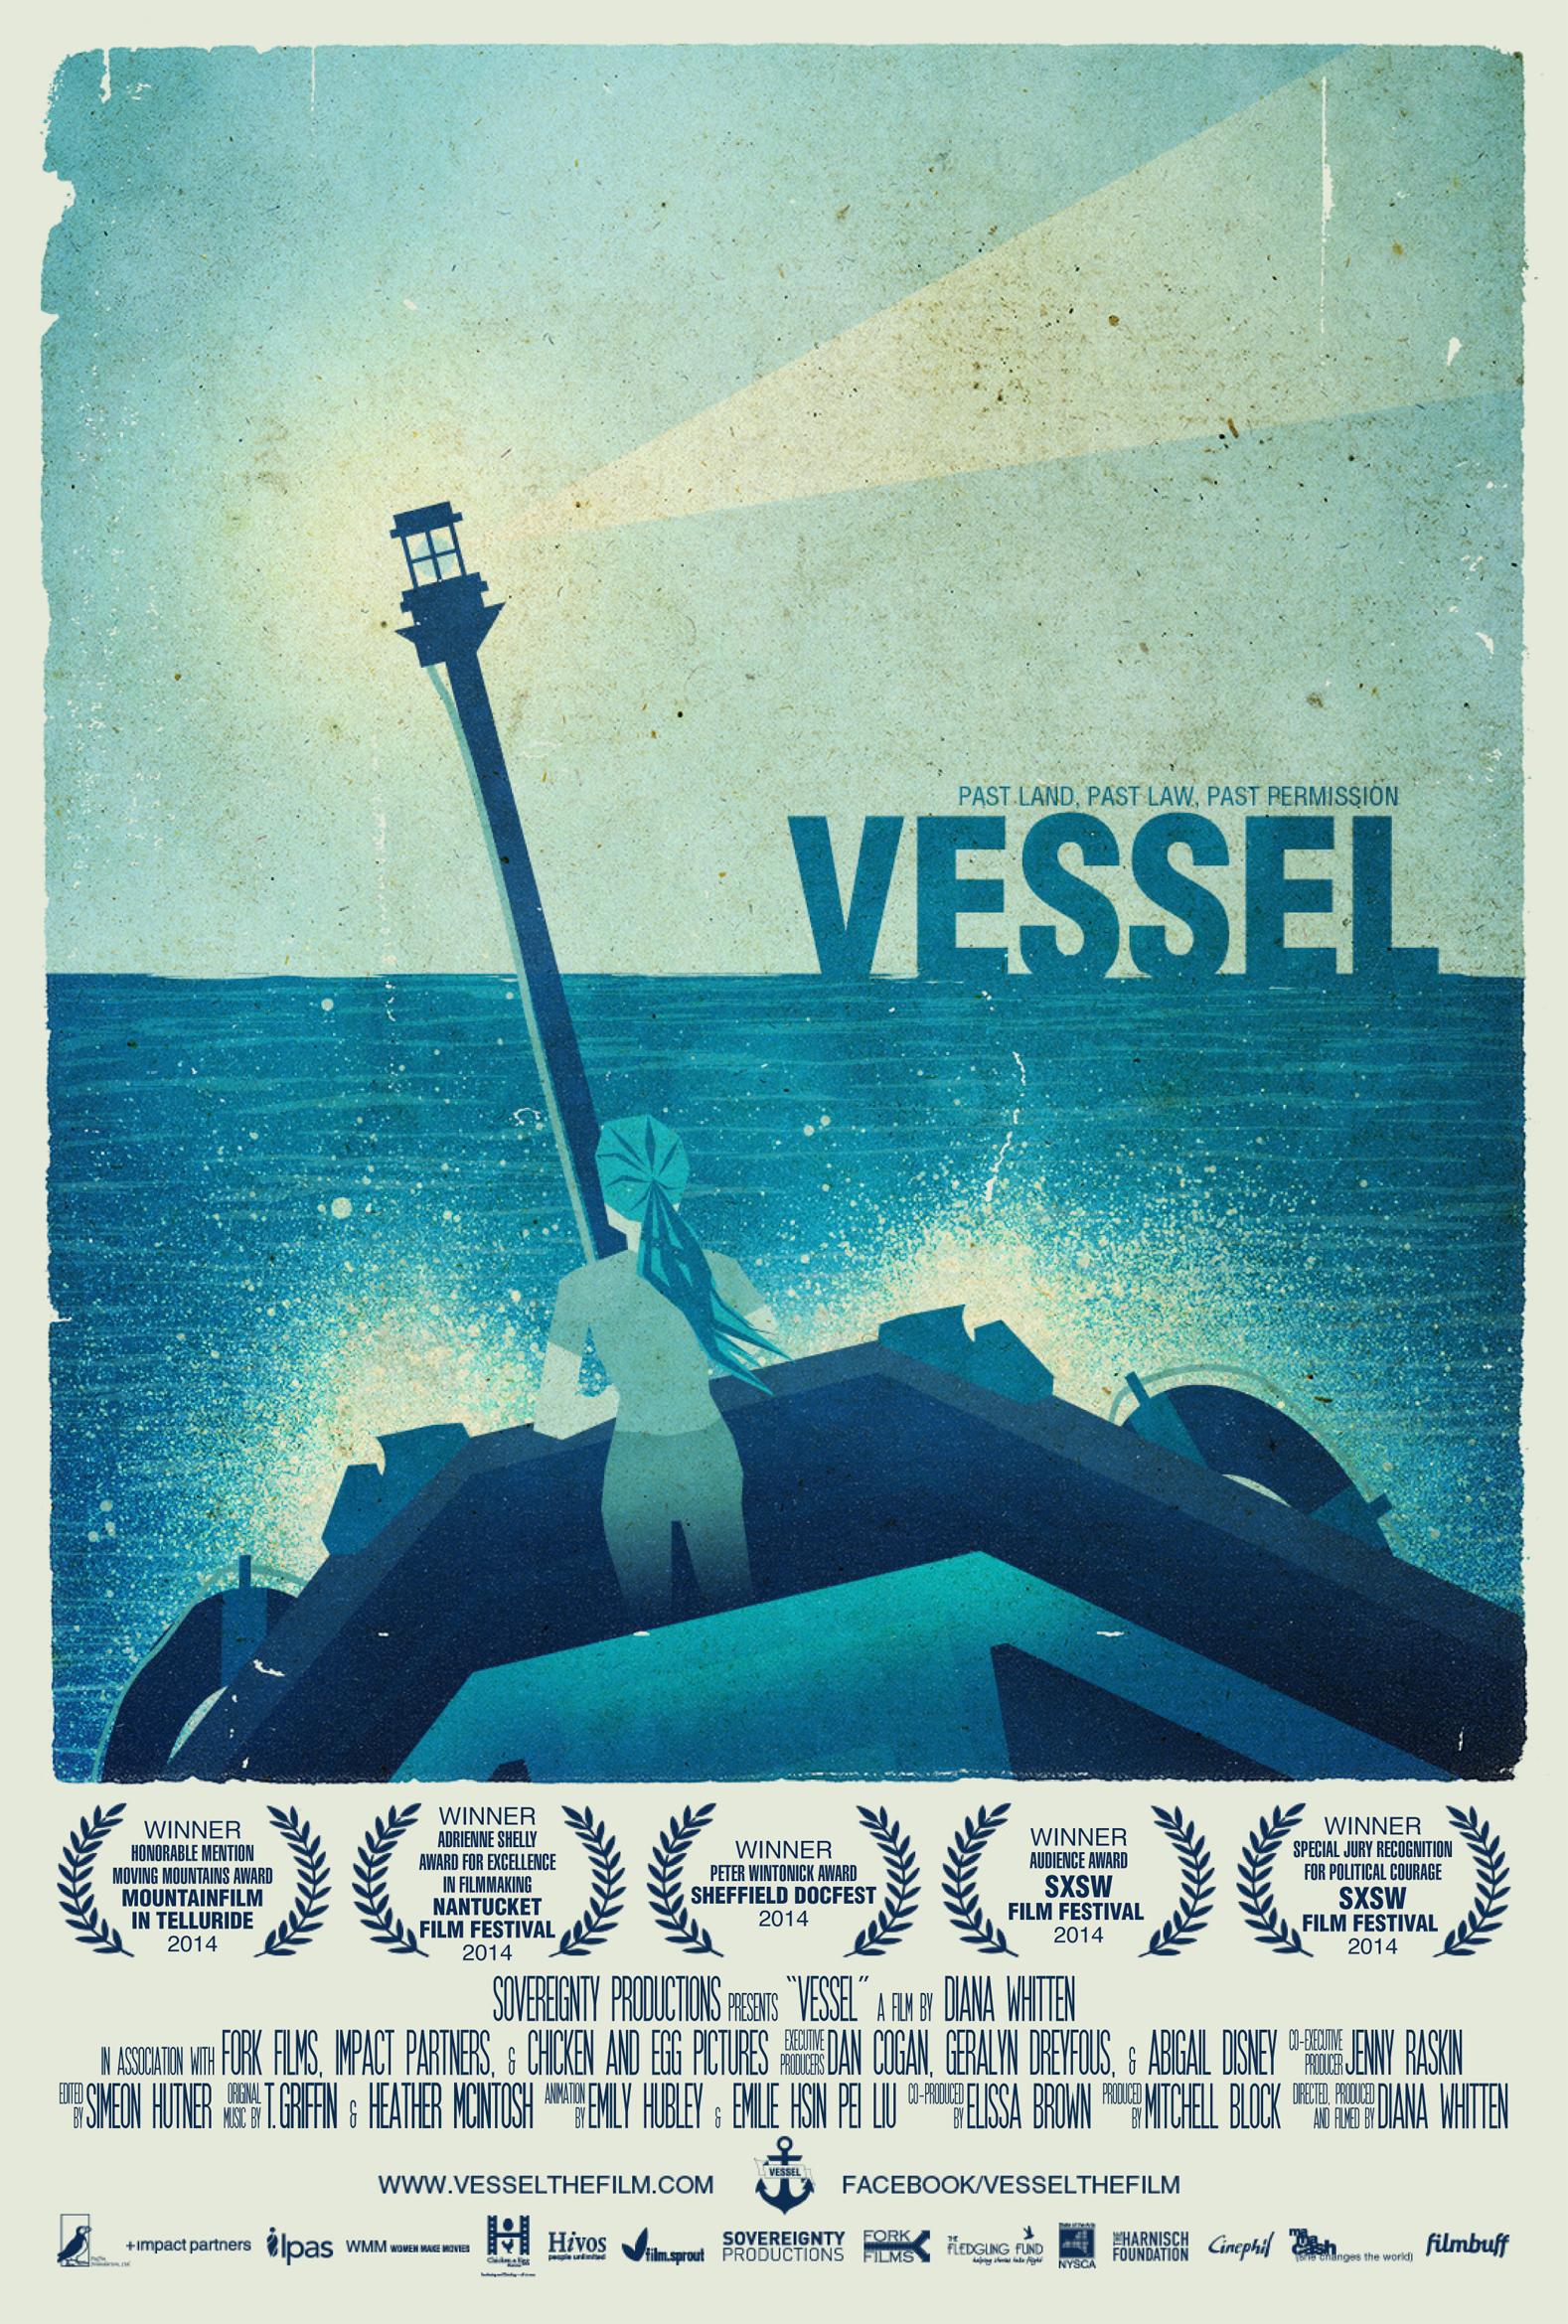 Vessel film poster